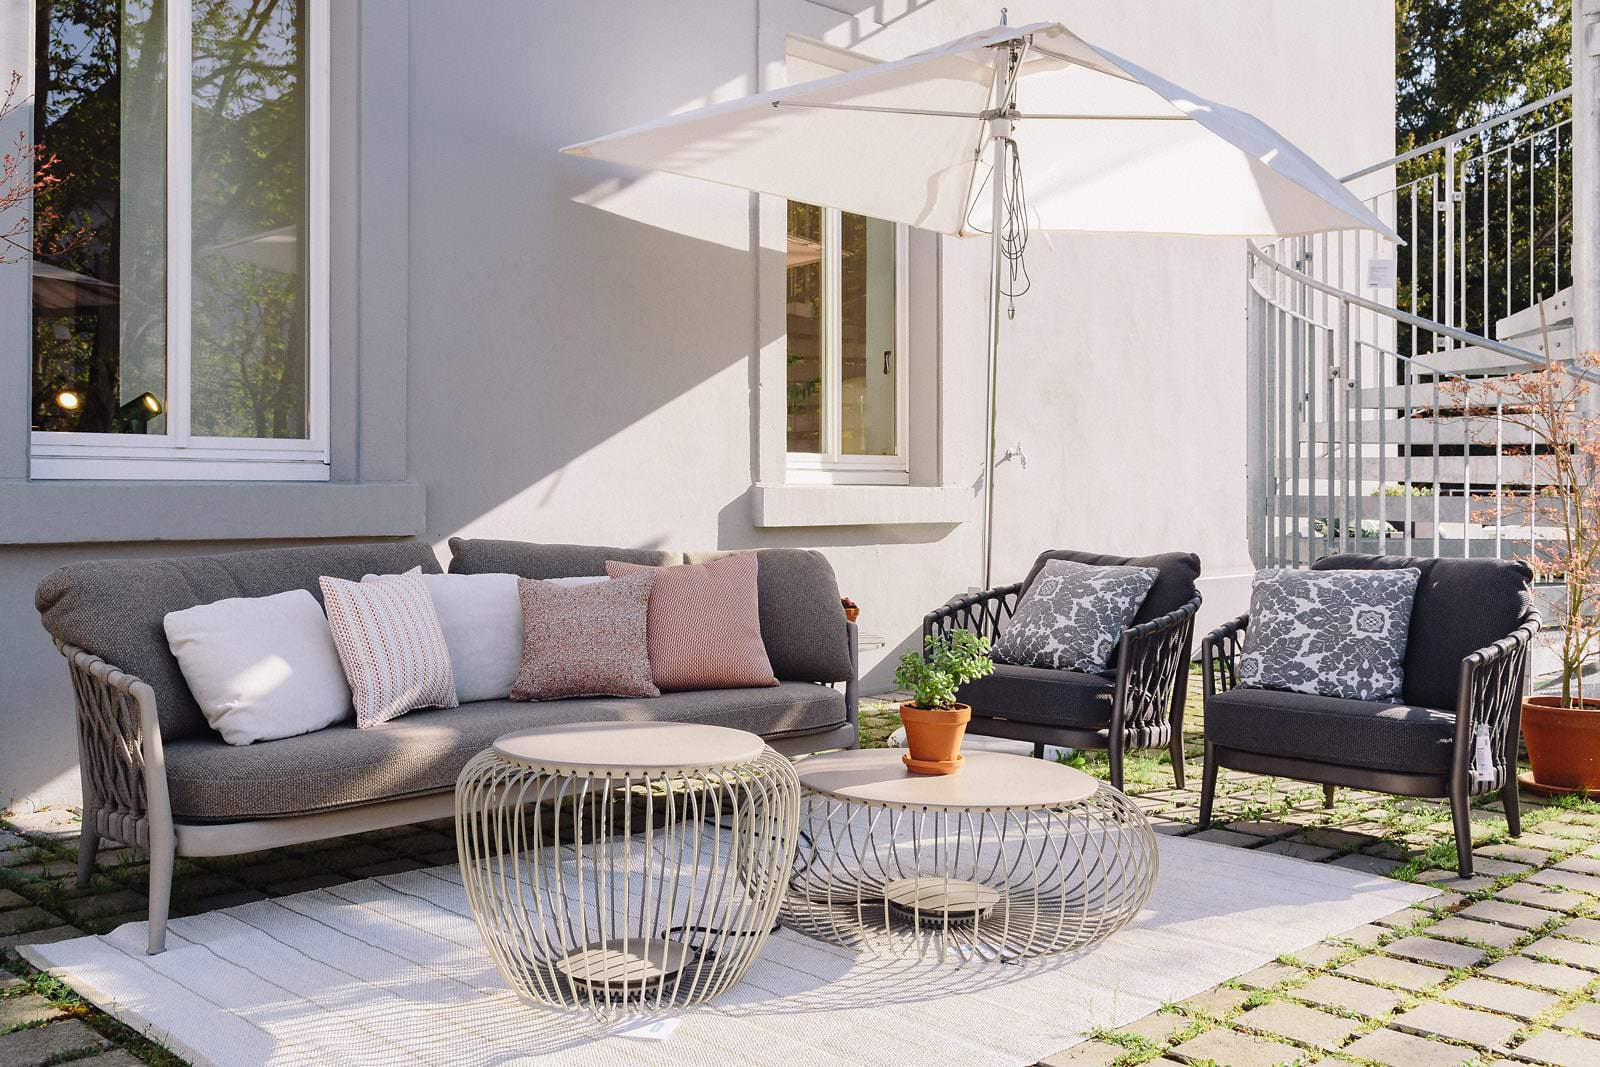 Full Size of Gartenmobel Lounge Design Wohnzimmer Gartensofa Tchibo